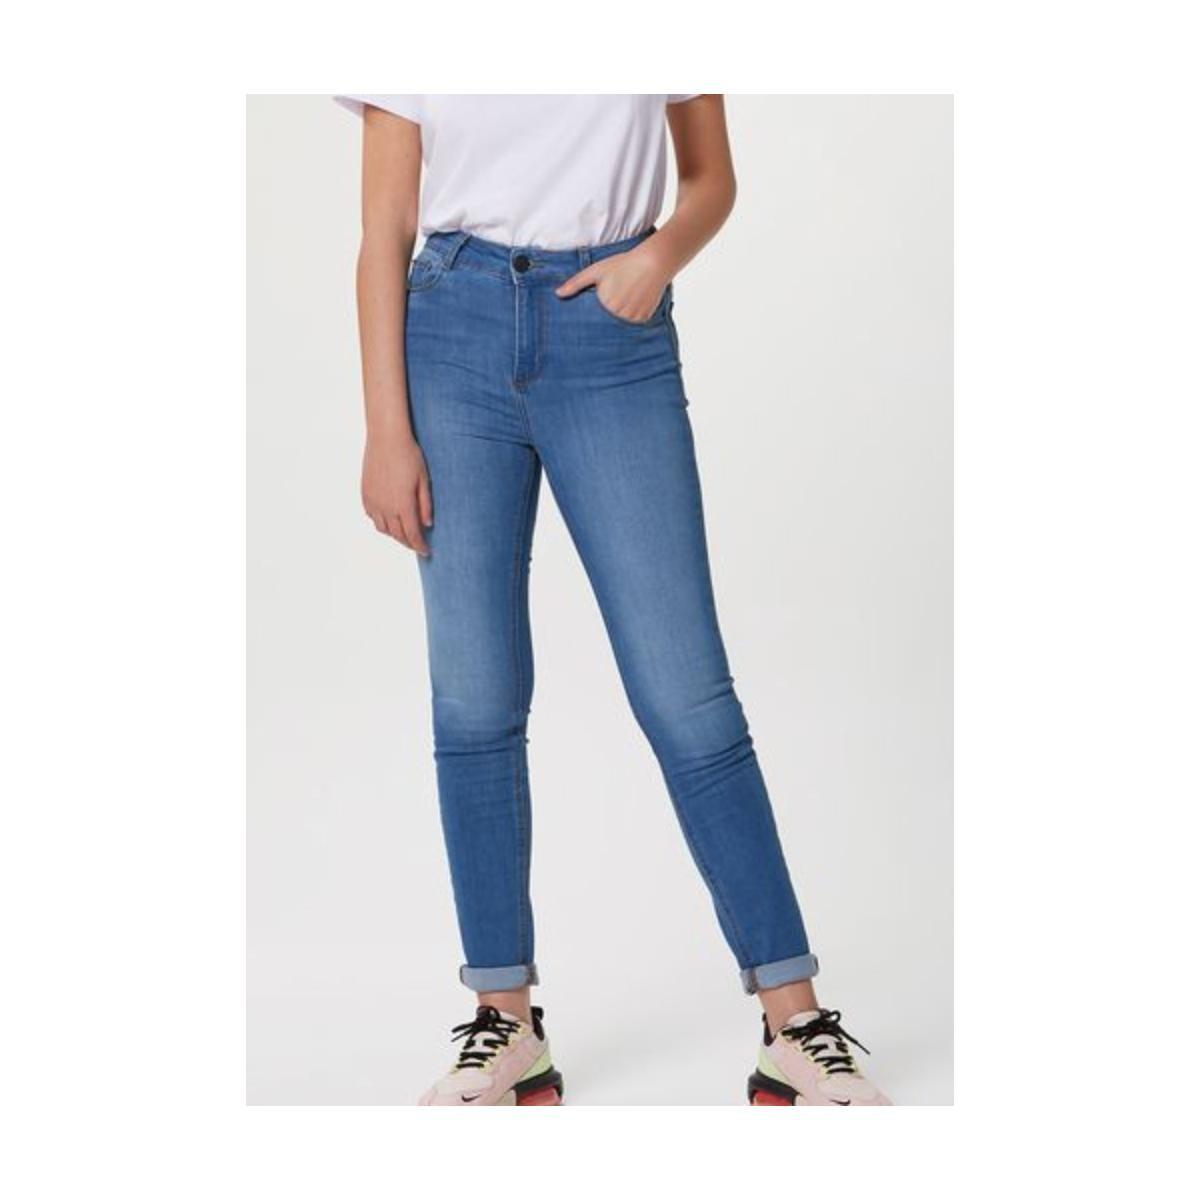 Calça Feminina Hering H998 1dsi Jeans Claro